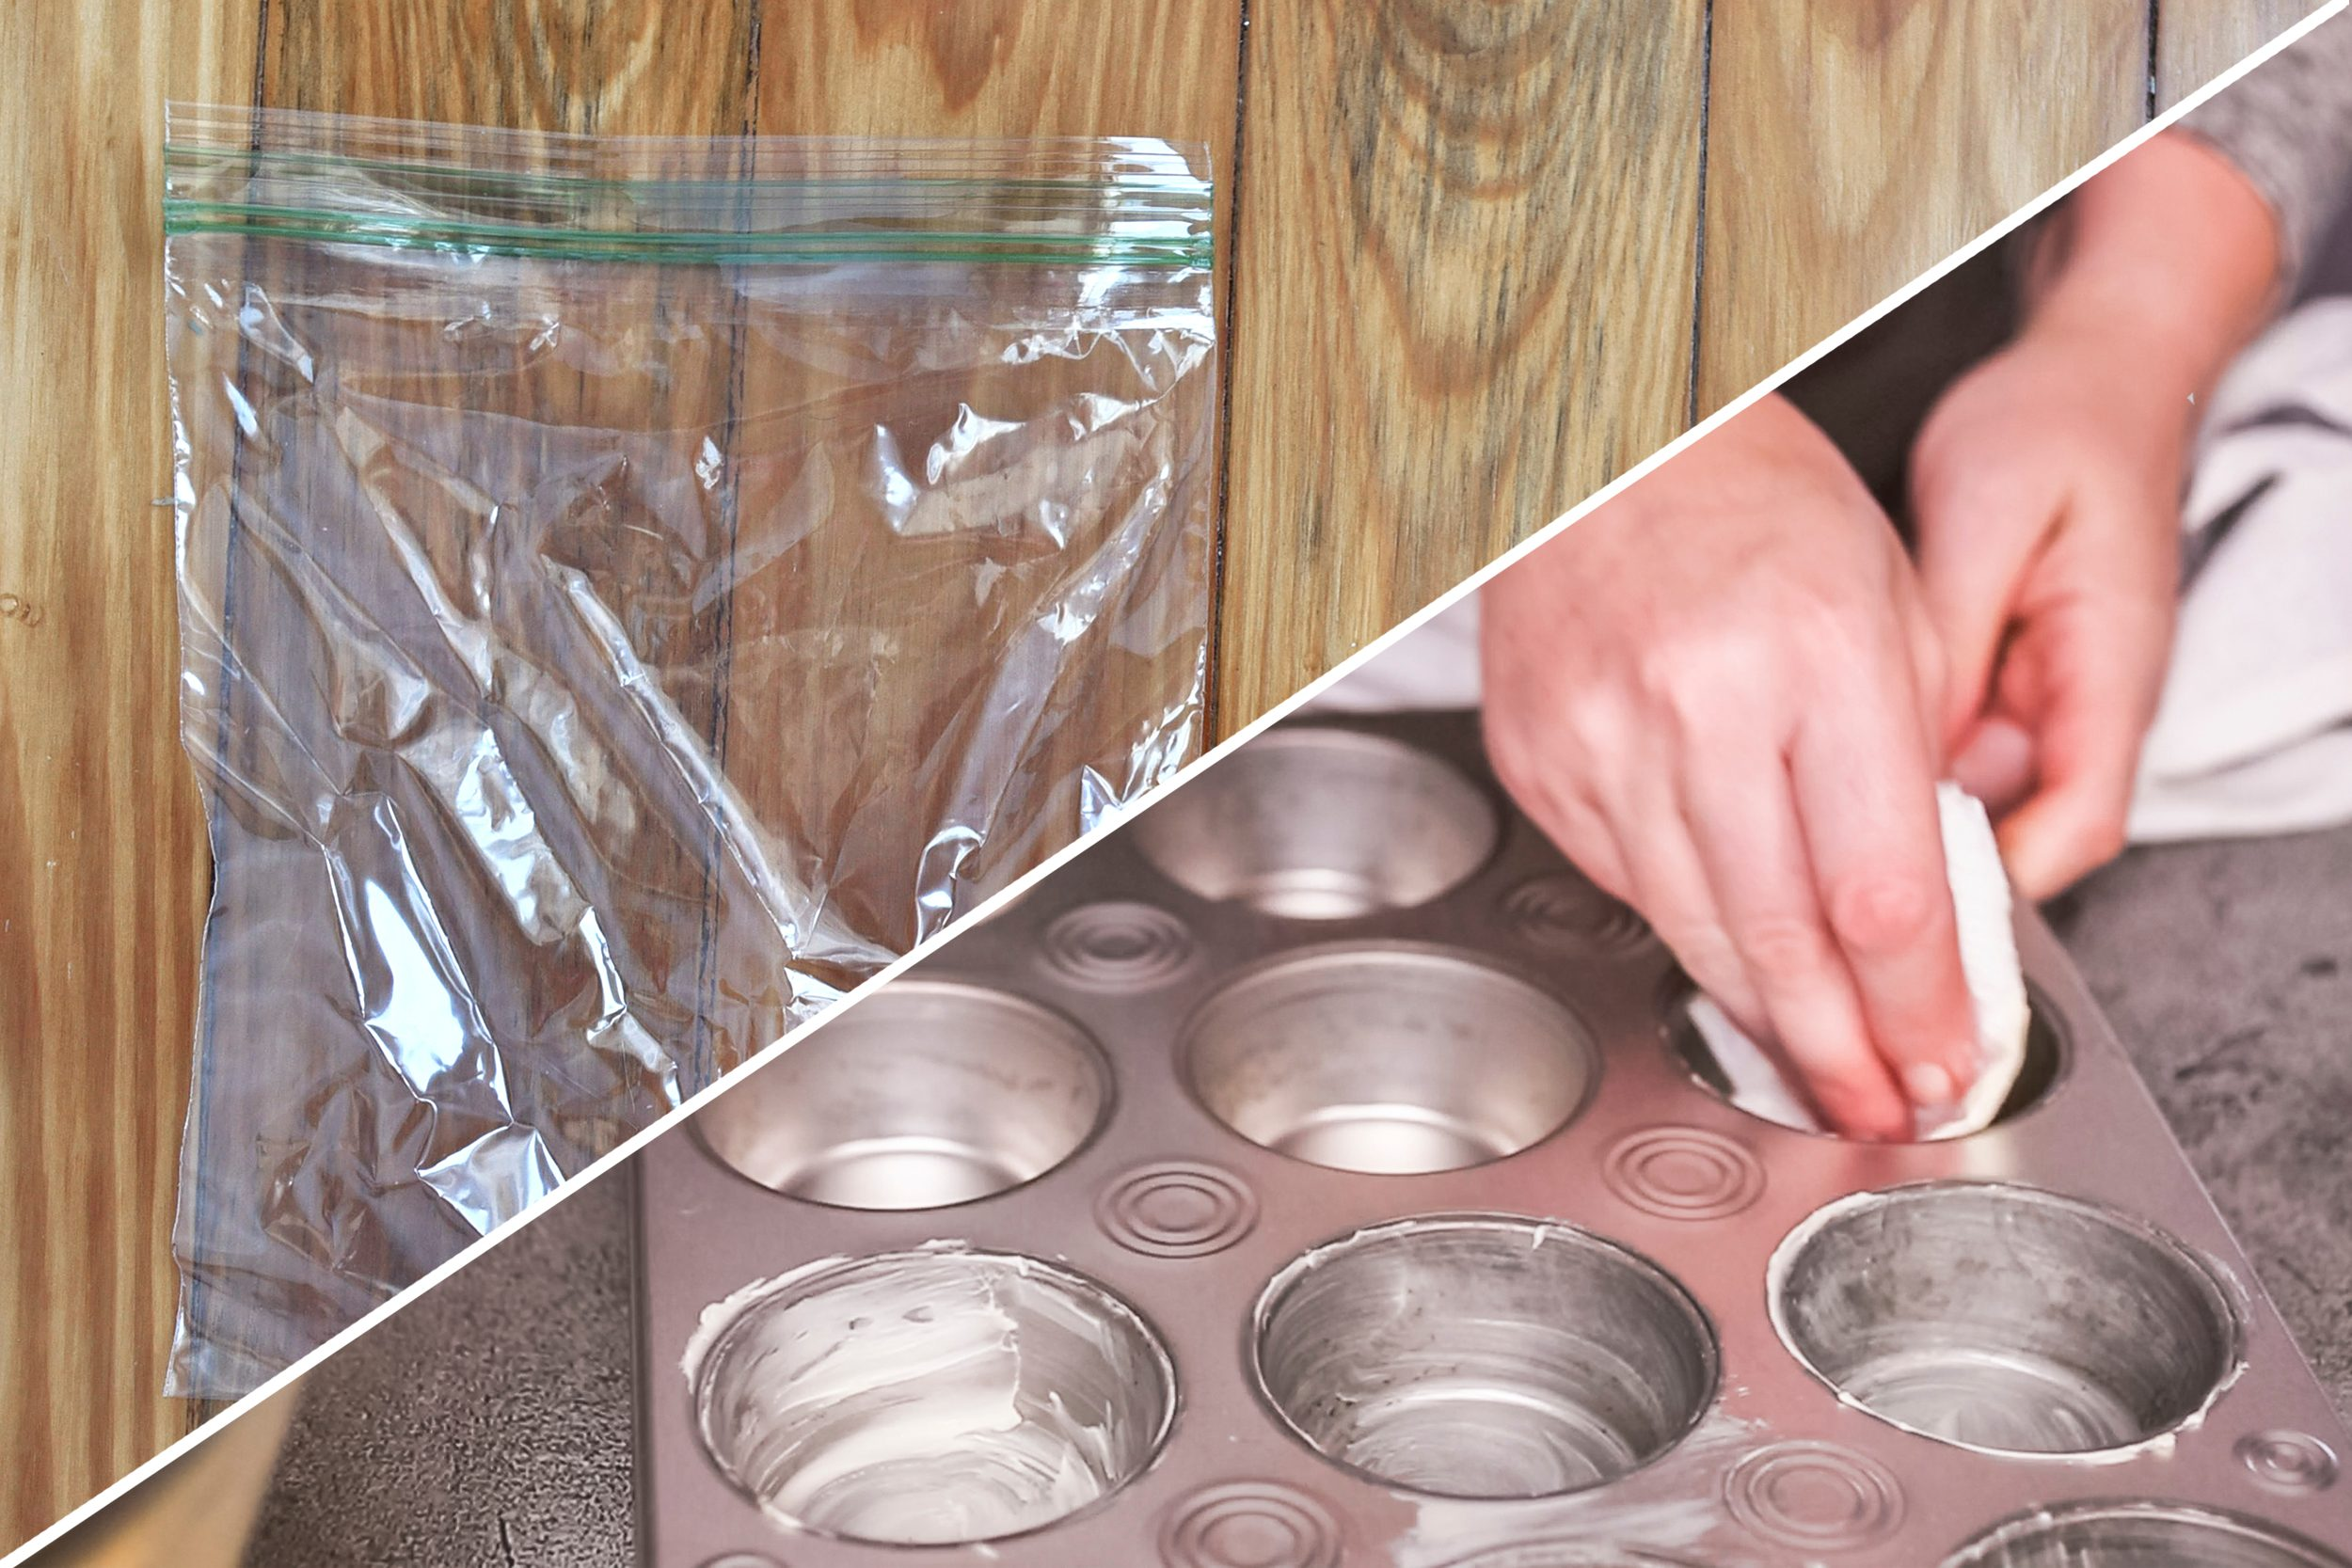 grease pan plastic bag uses life hacks